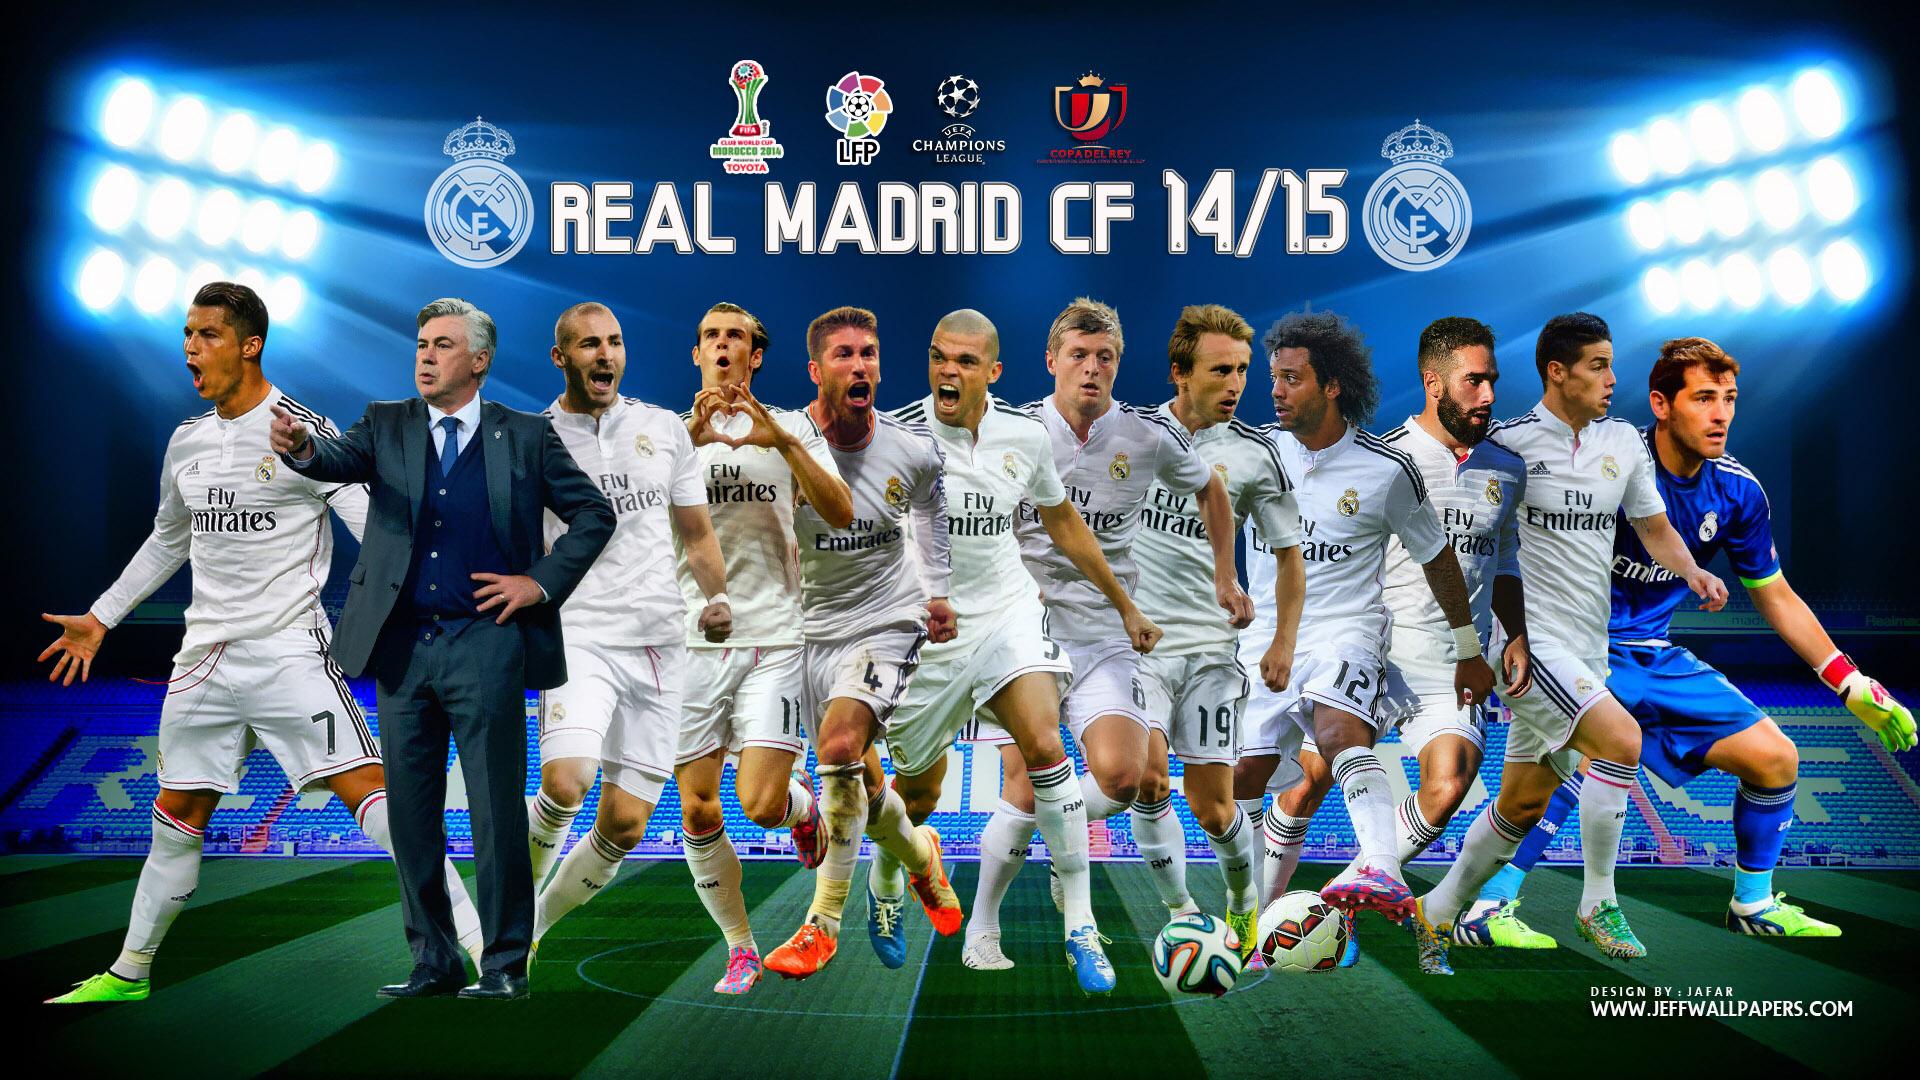 Download Real Madrid Spanish Club 2015 Team HD Wallpaper Stylish 1920x1080